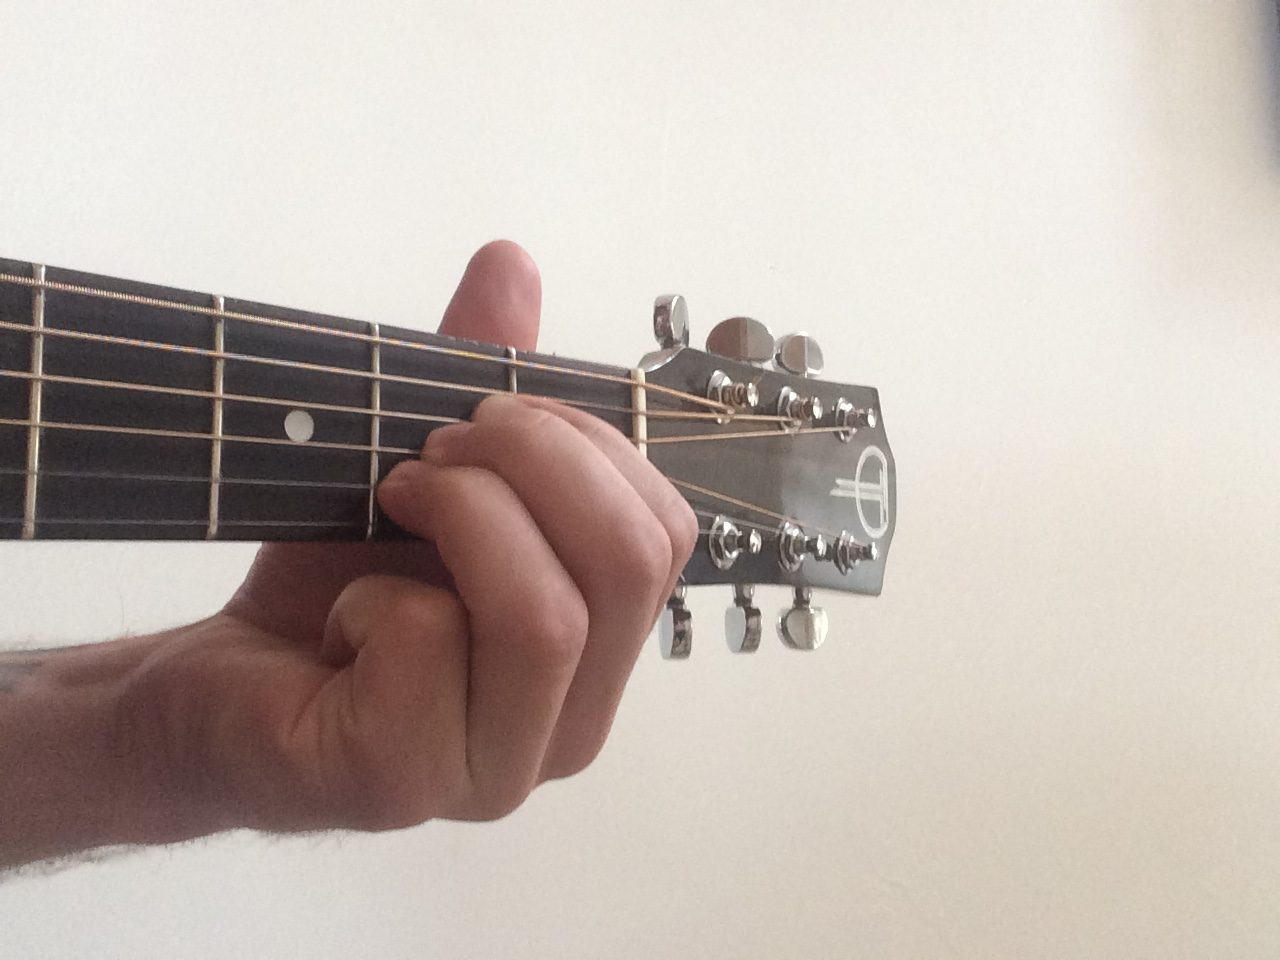 easy guitar chords for beginners guitar coach. Black Bedroom Furniture Sets. Home Design Ideas